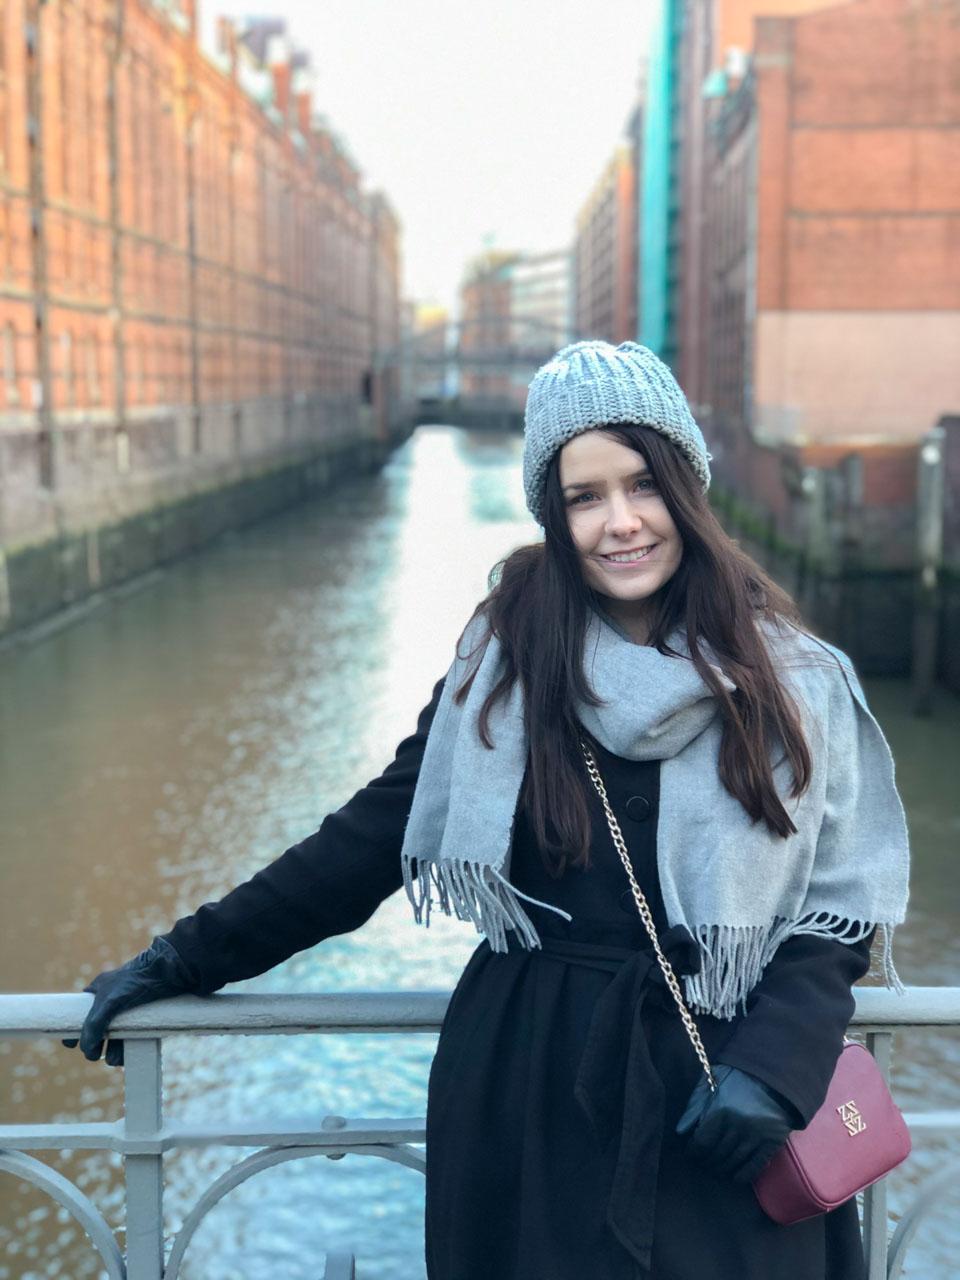 A girl in a black coat standing in Speicherstadt in Hamburg